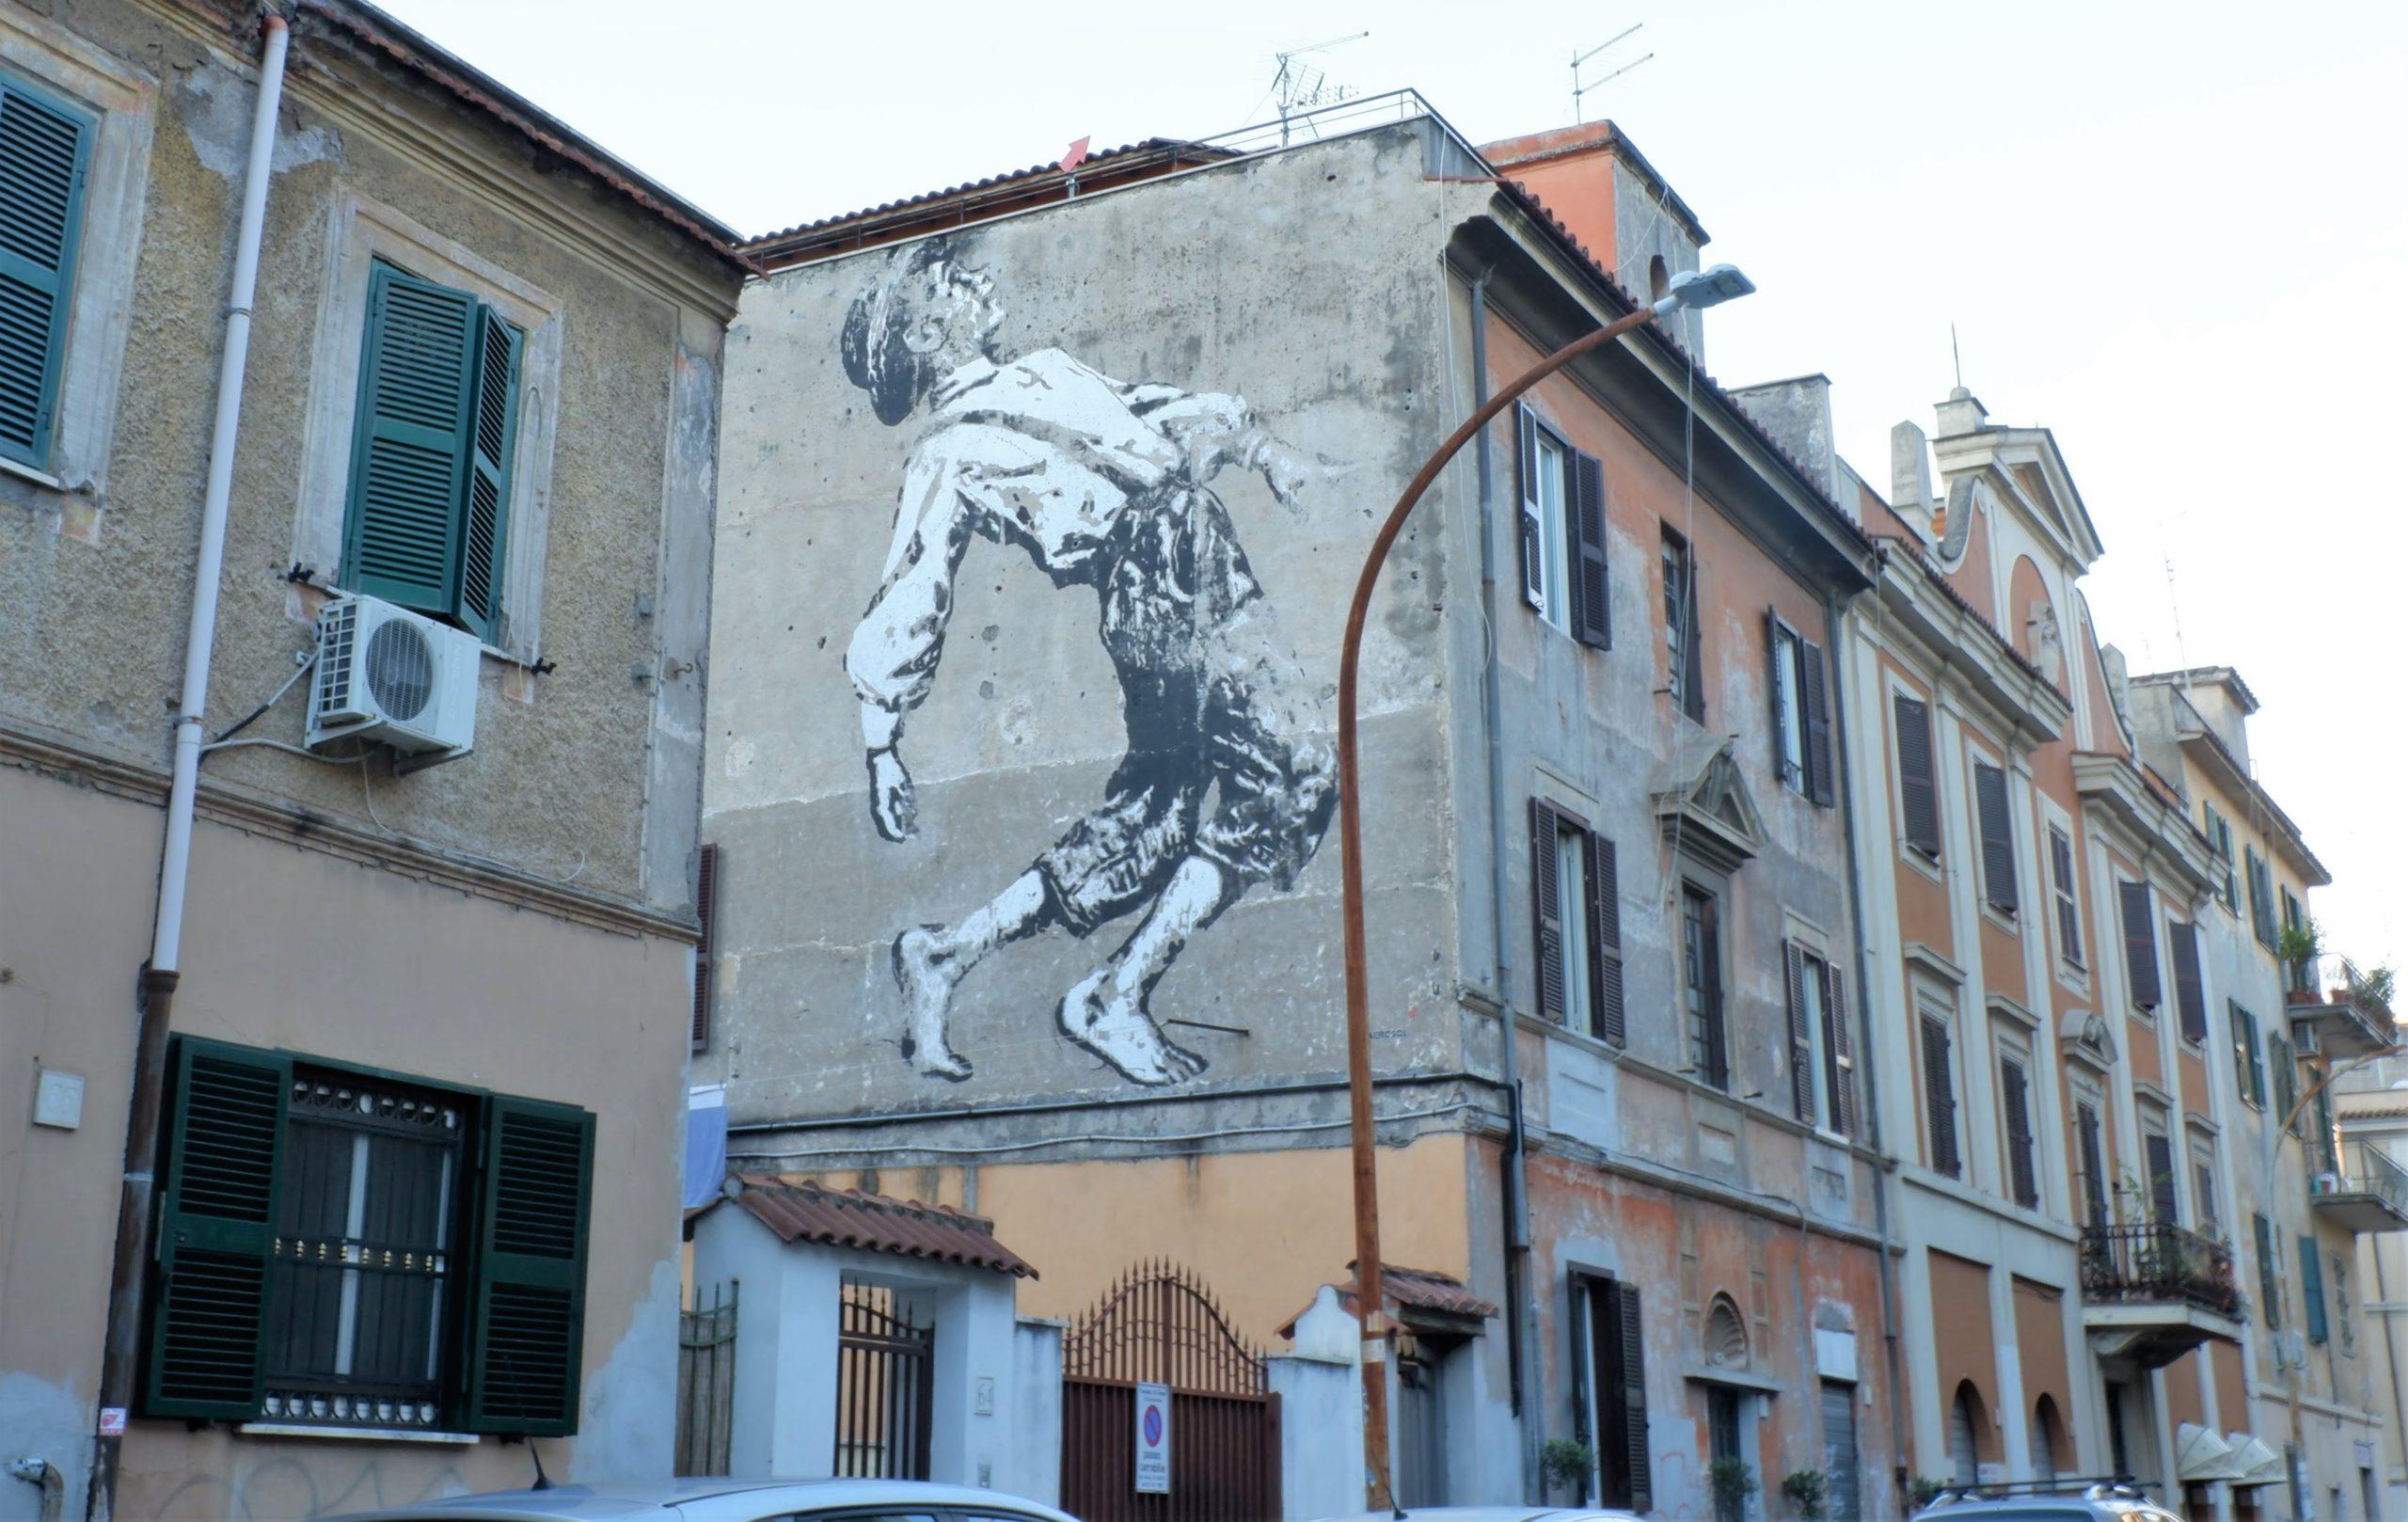 jeff aerosol murales tor pignattara